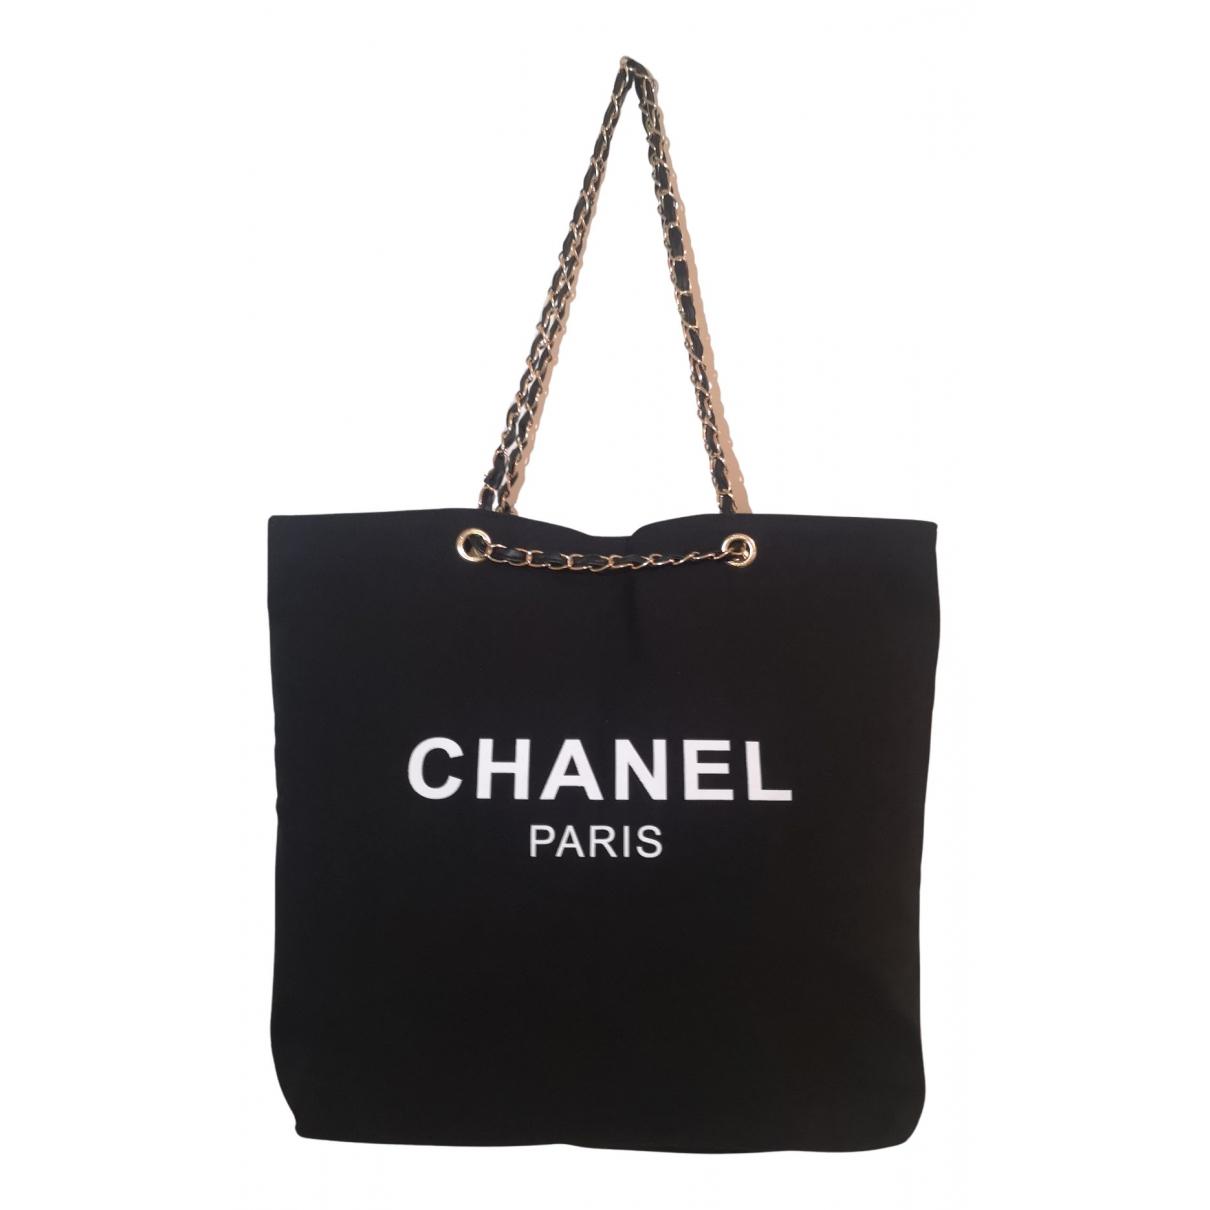 Chanel \N Black Cotton handbag for Women \N